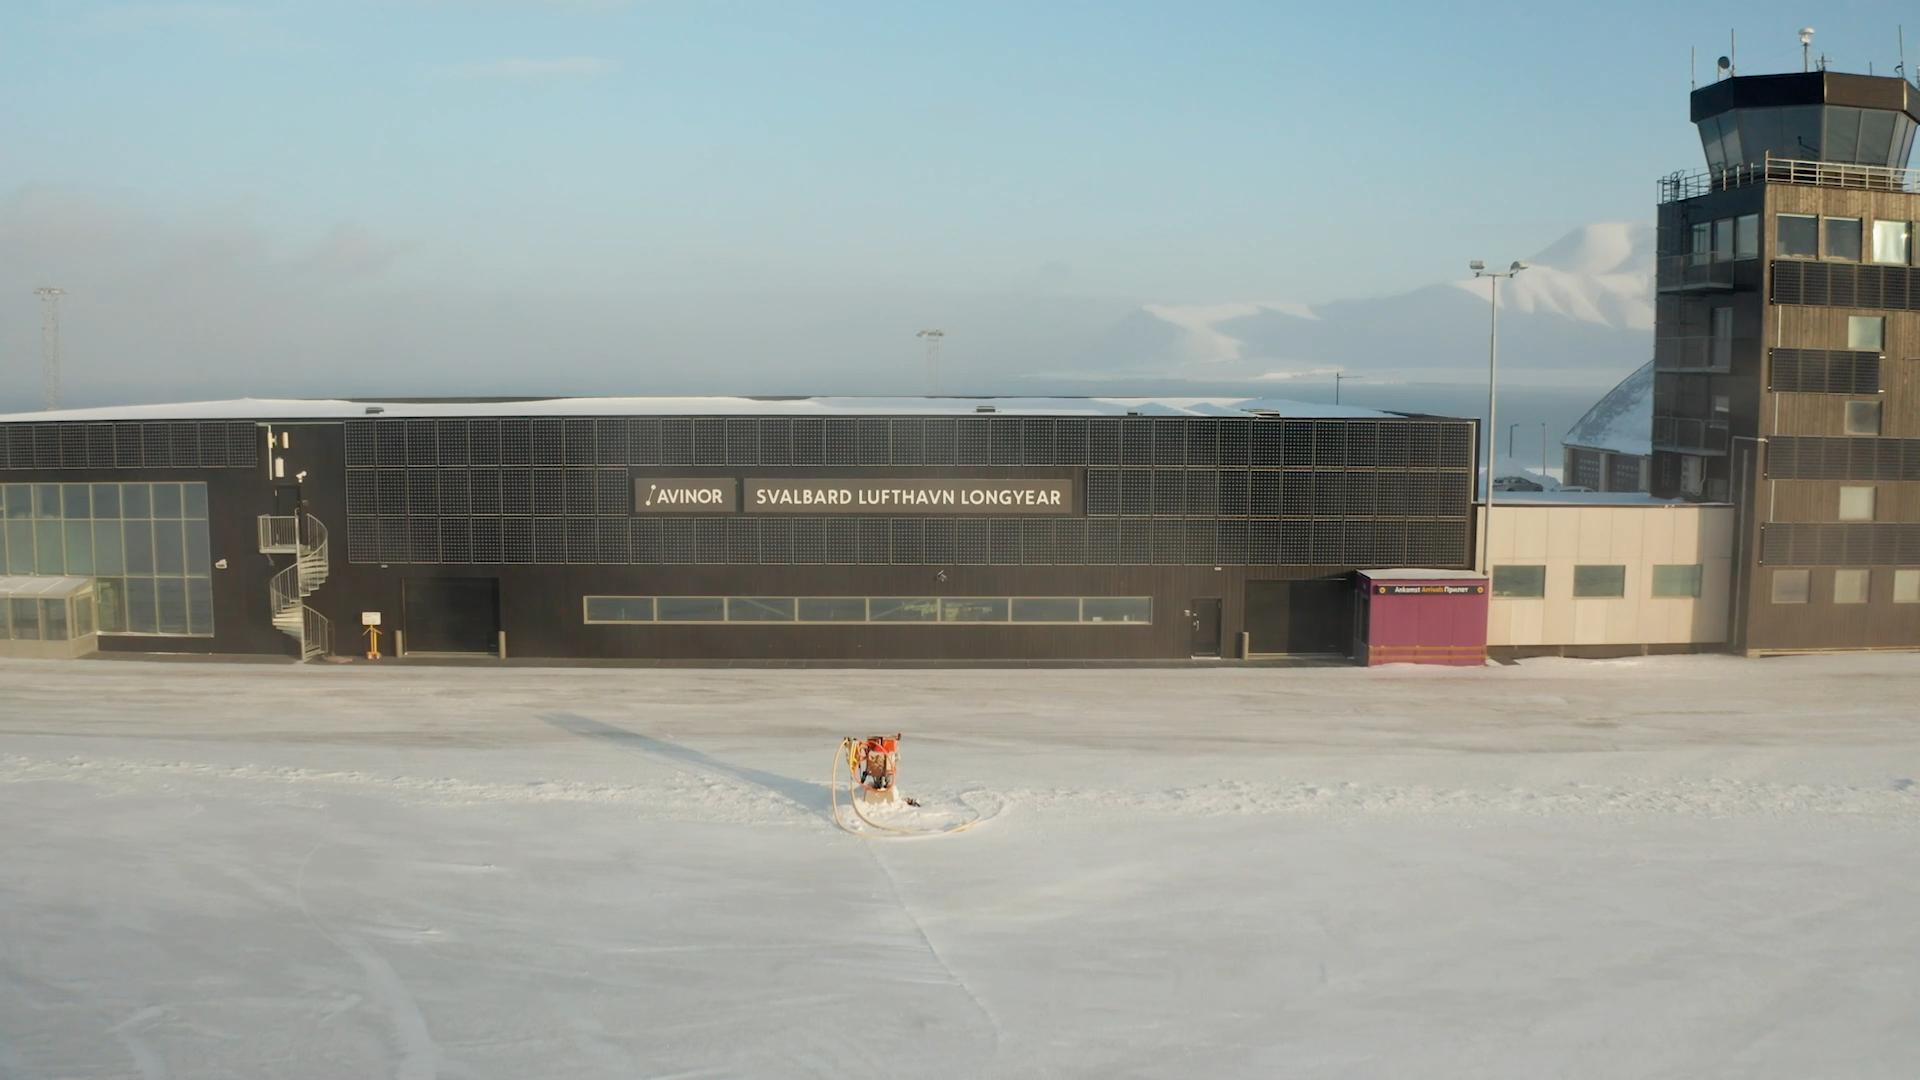 Svalbard Lufthavn